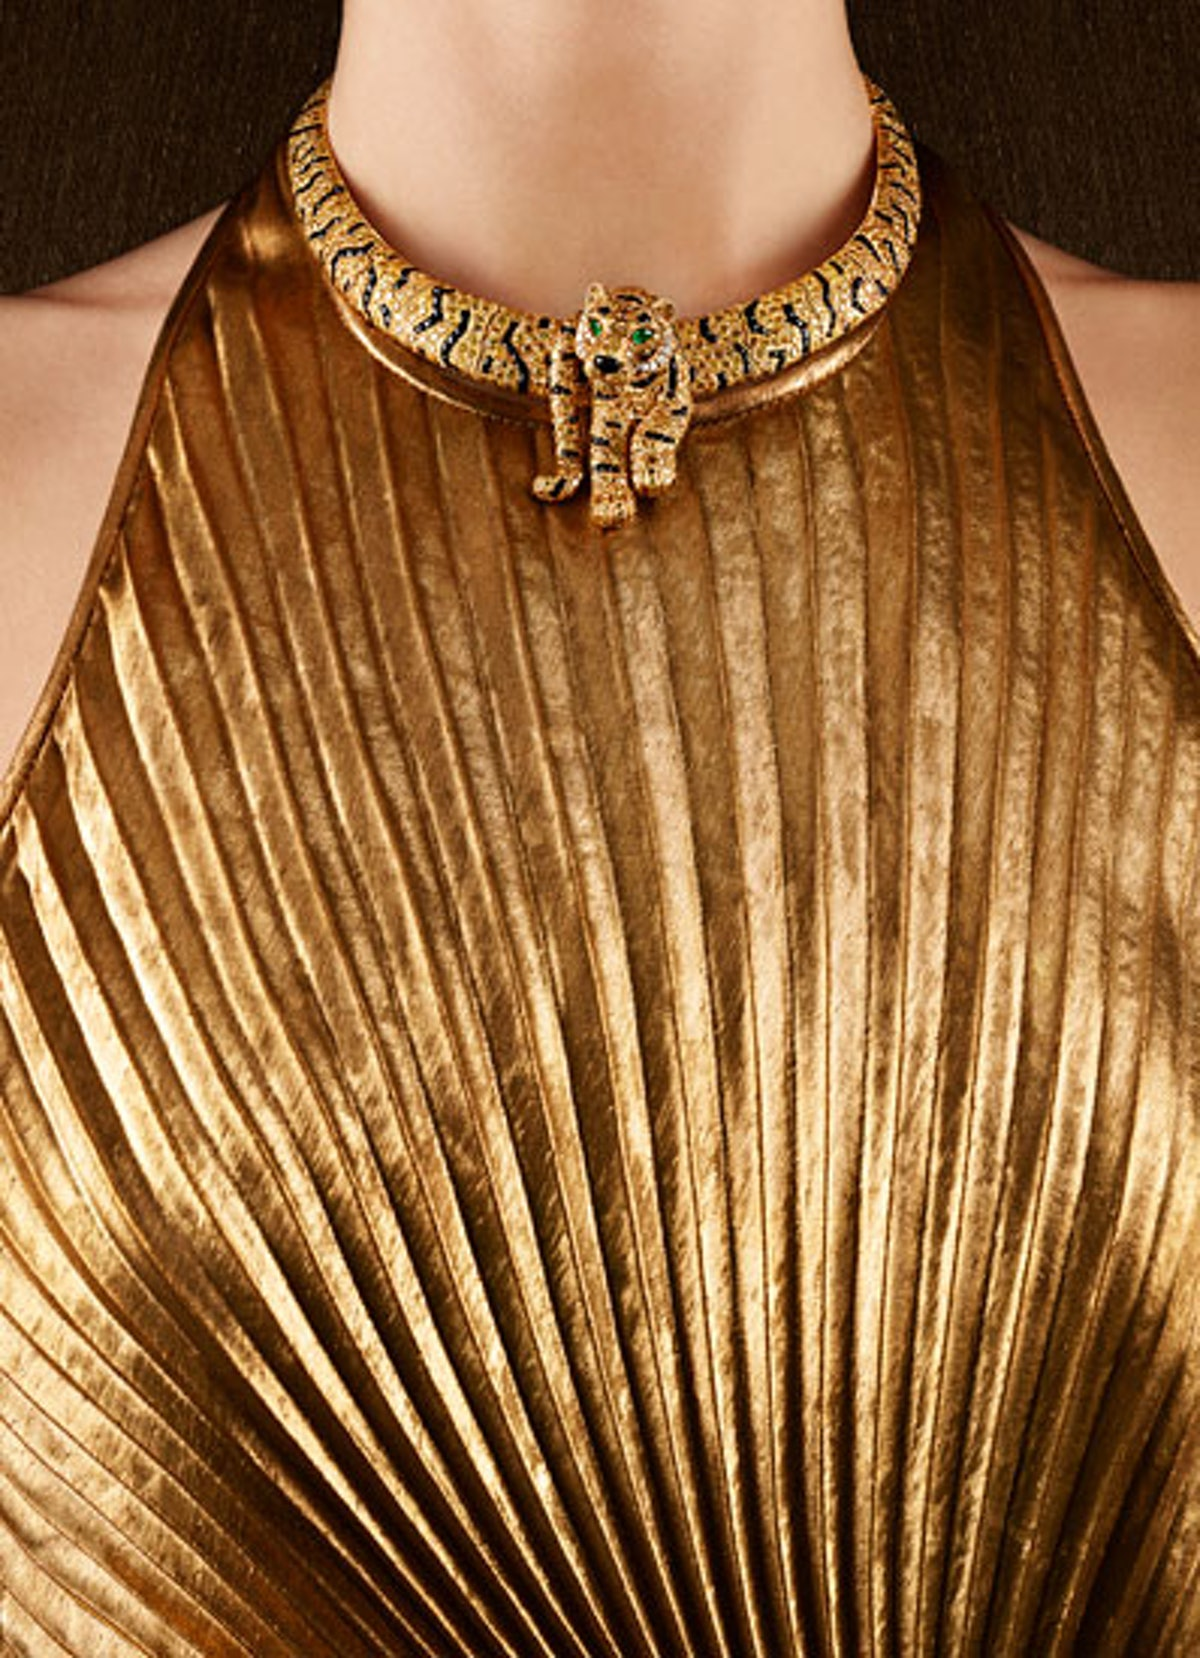 acss-decades-costume-jewelry-08-v.jpg